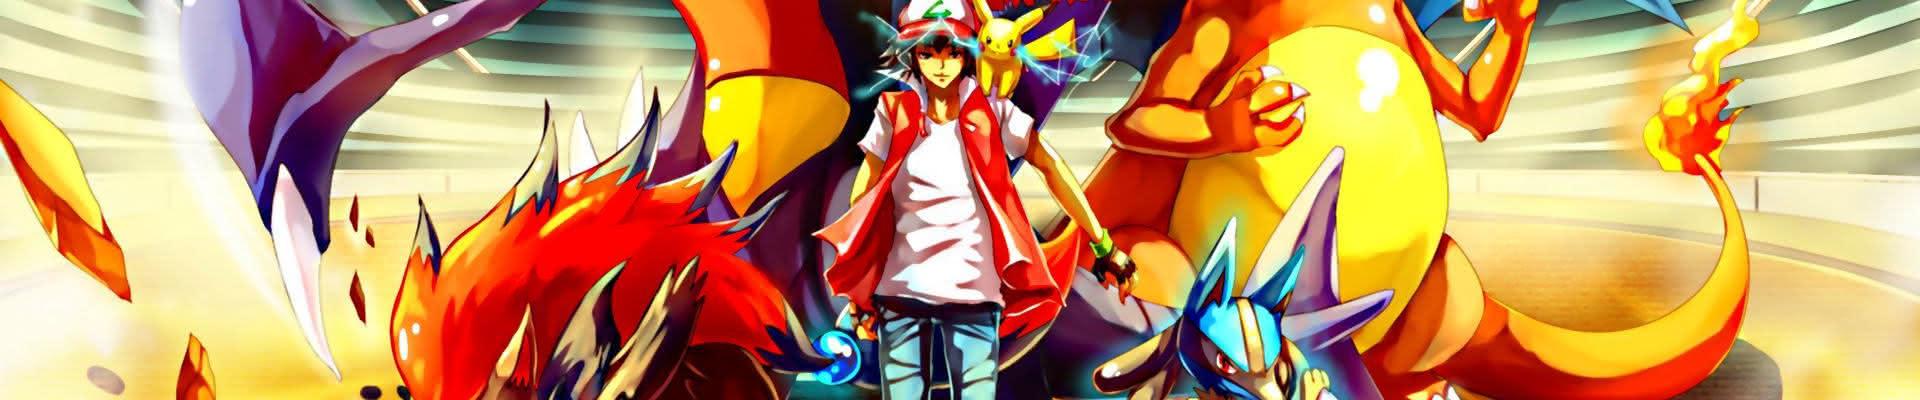 Pokémon the Origin